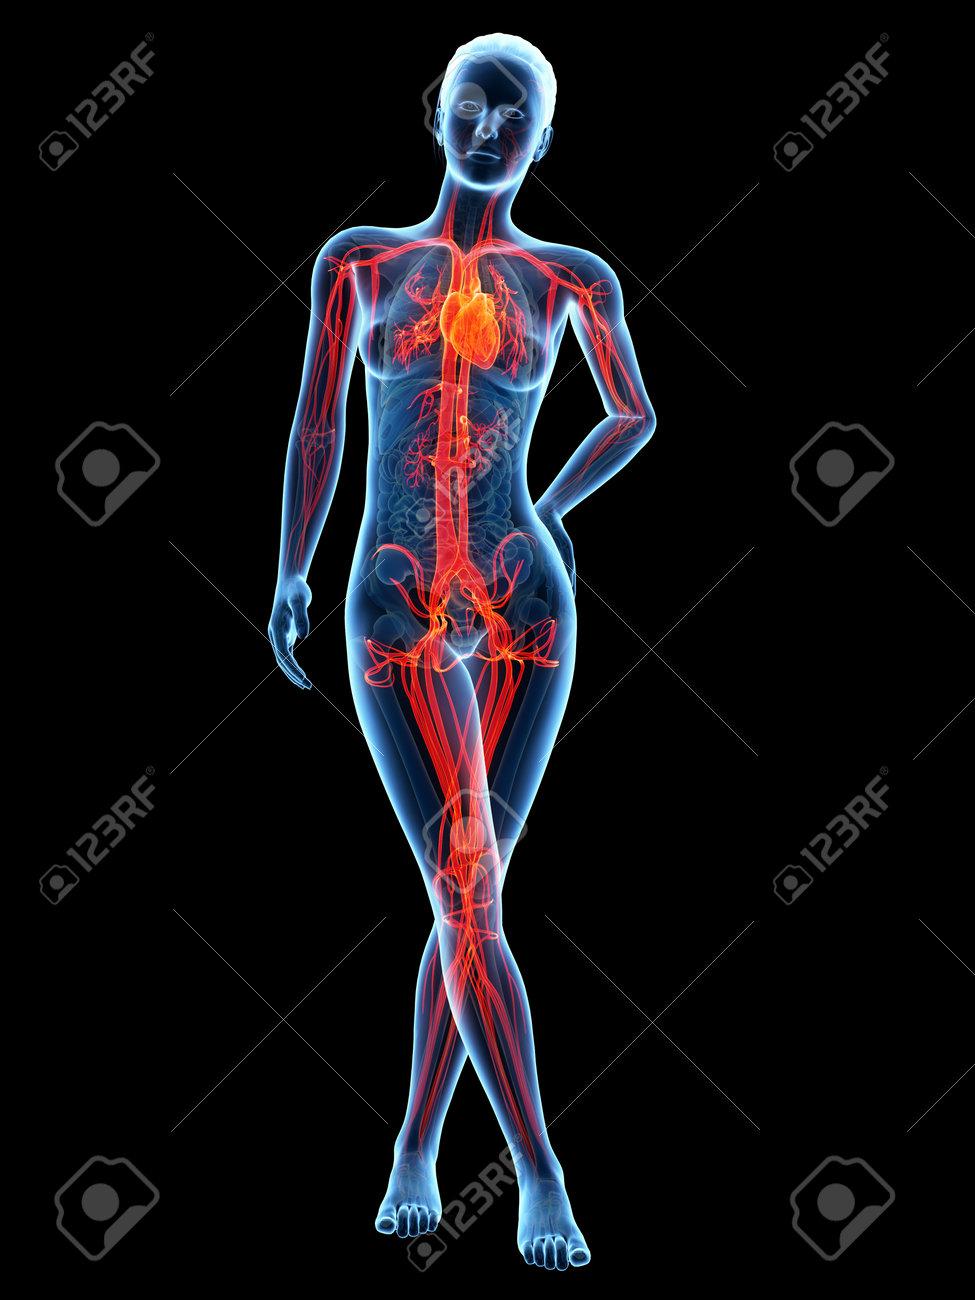 Medical 3d Illustration - Female Anatomy - Cardiovascular System ...